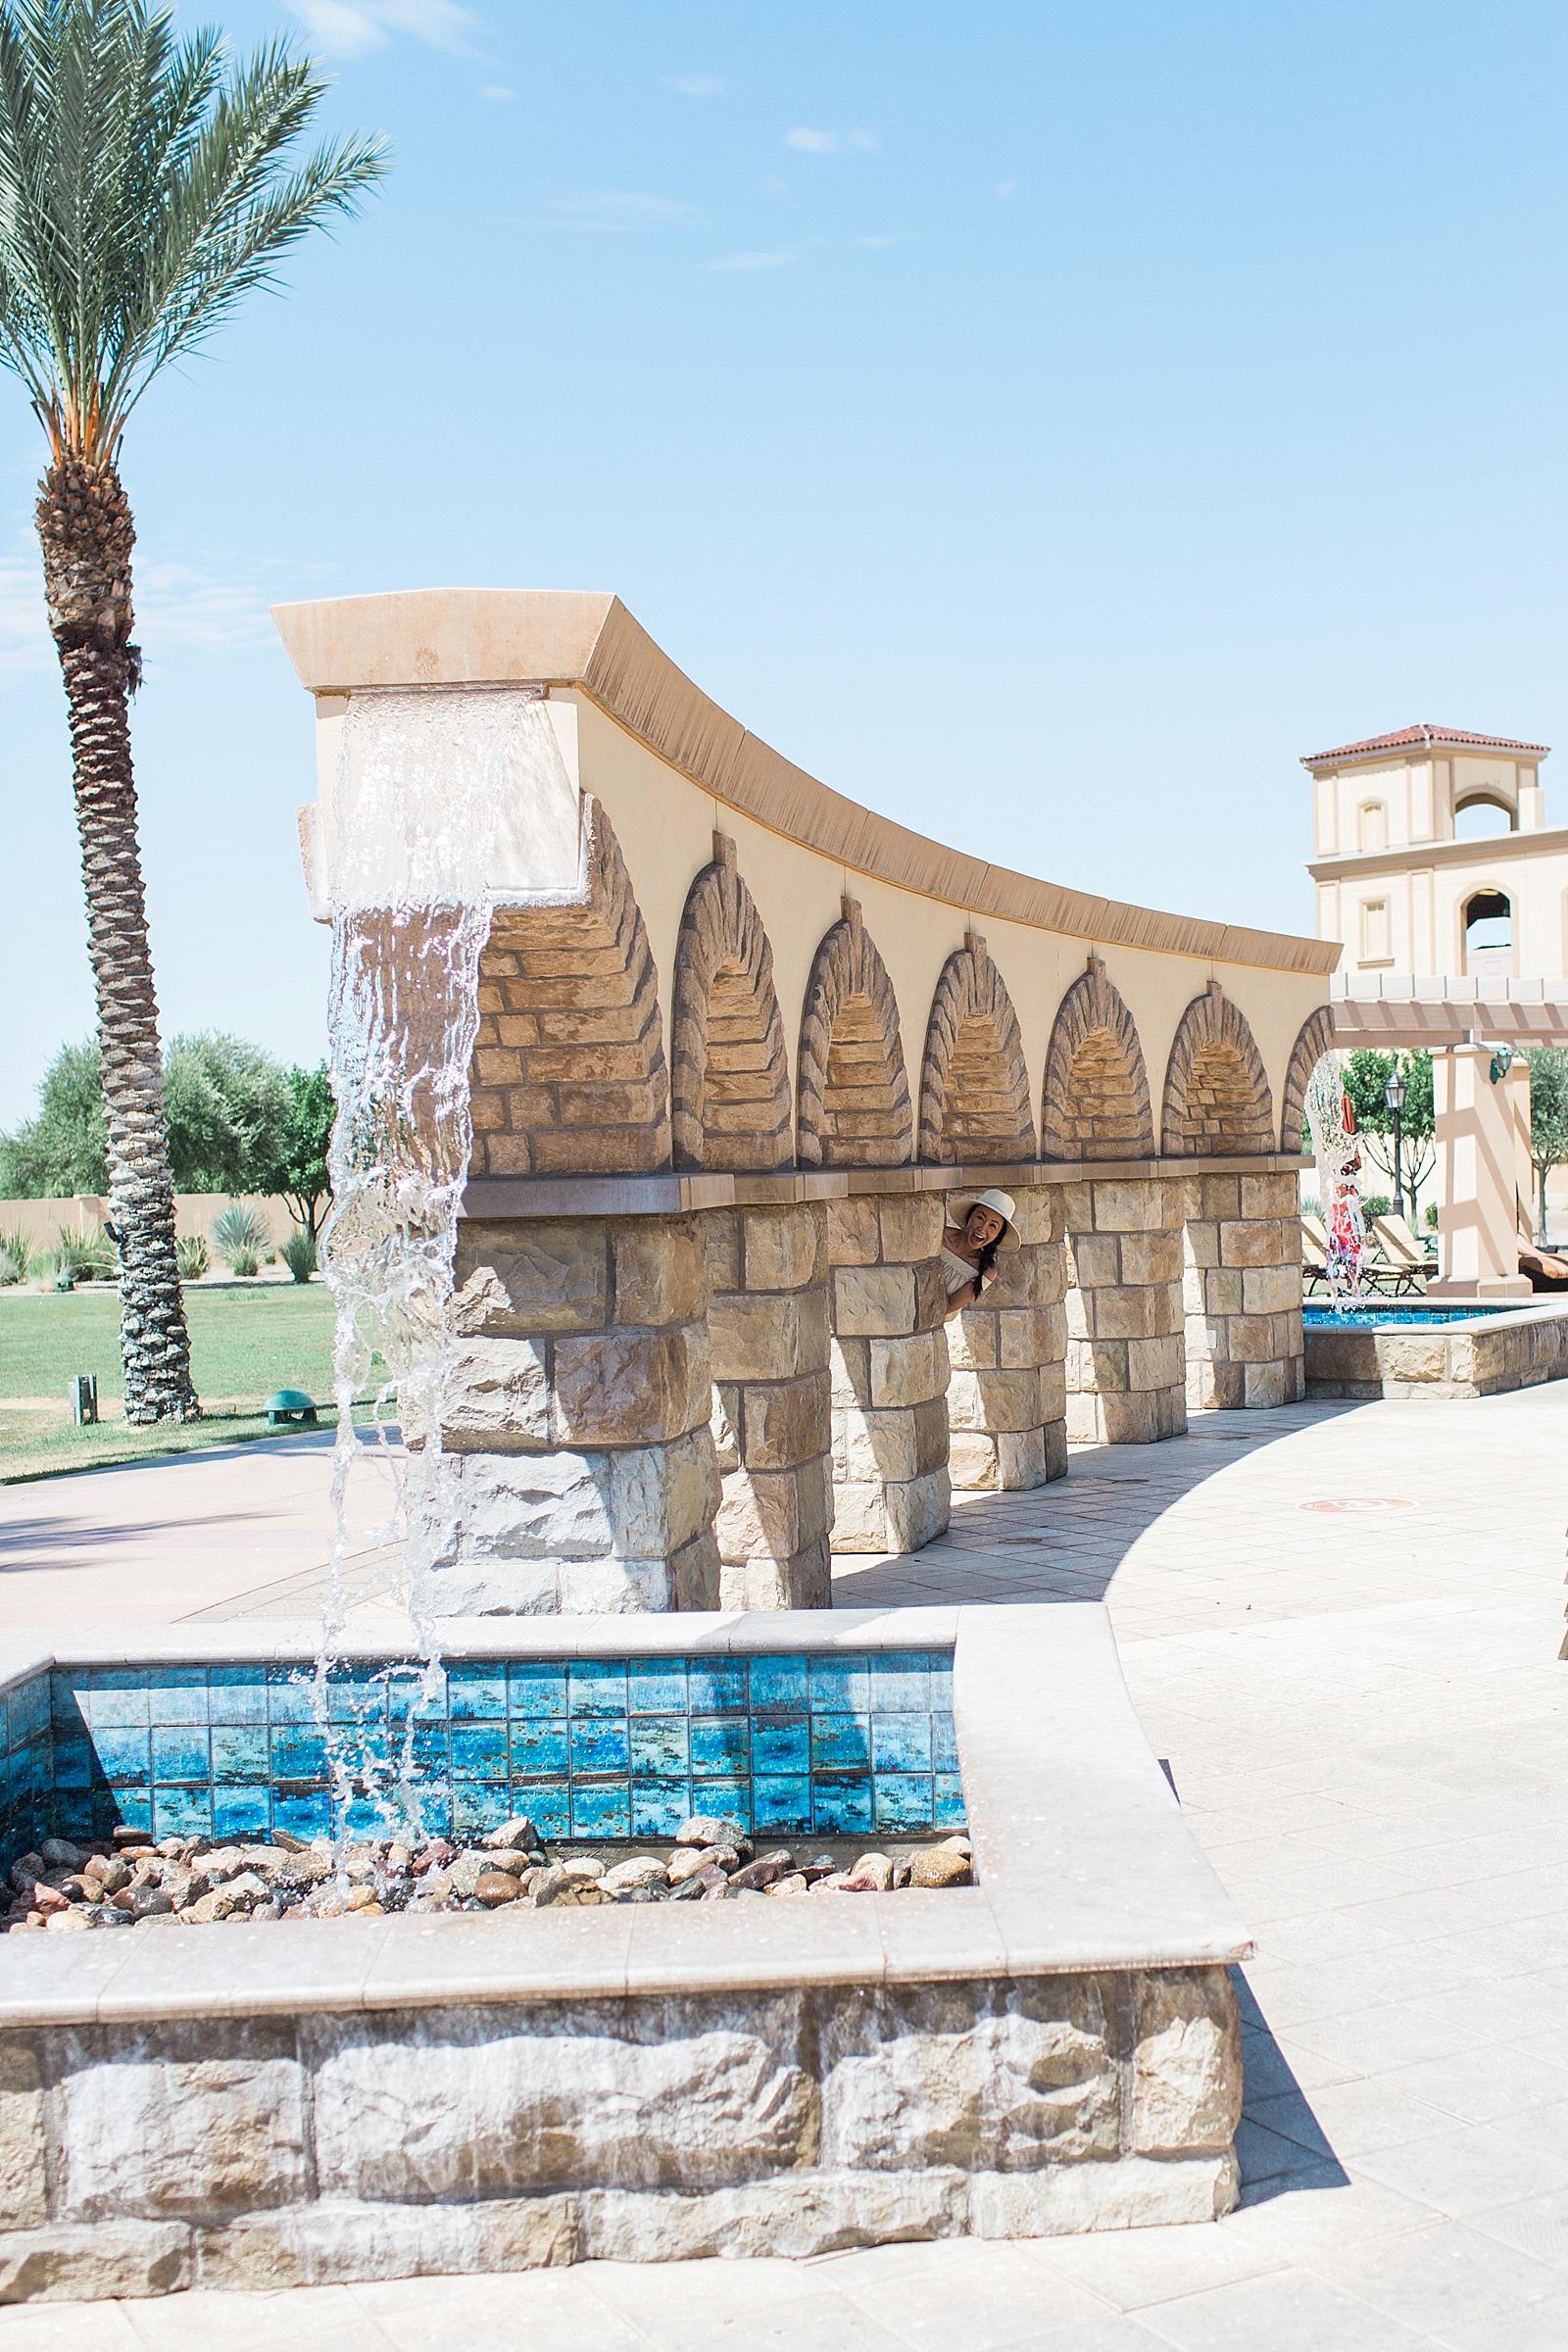 casino-del-sol-hotel-tucson-review-stay-diana-elizabeth-blog_0011